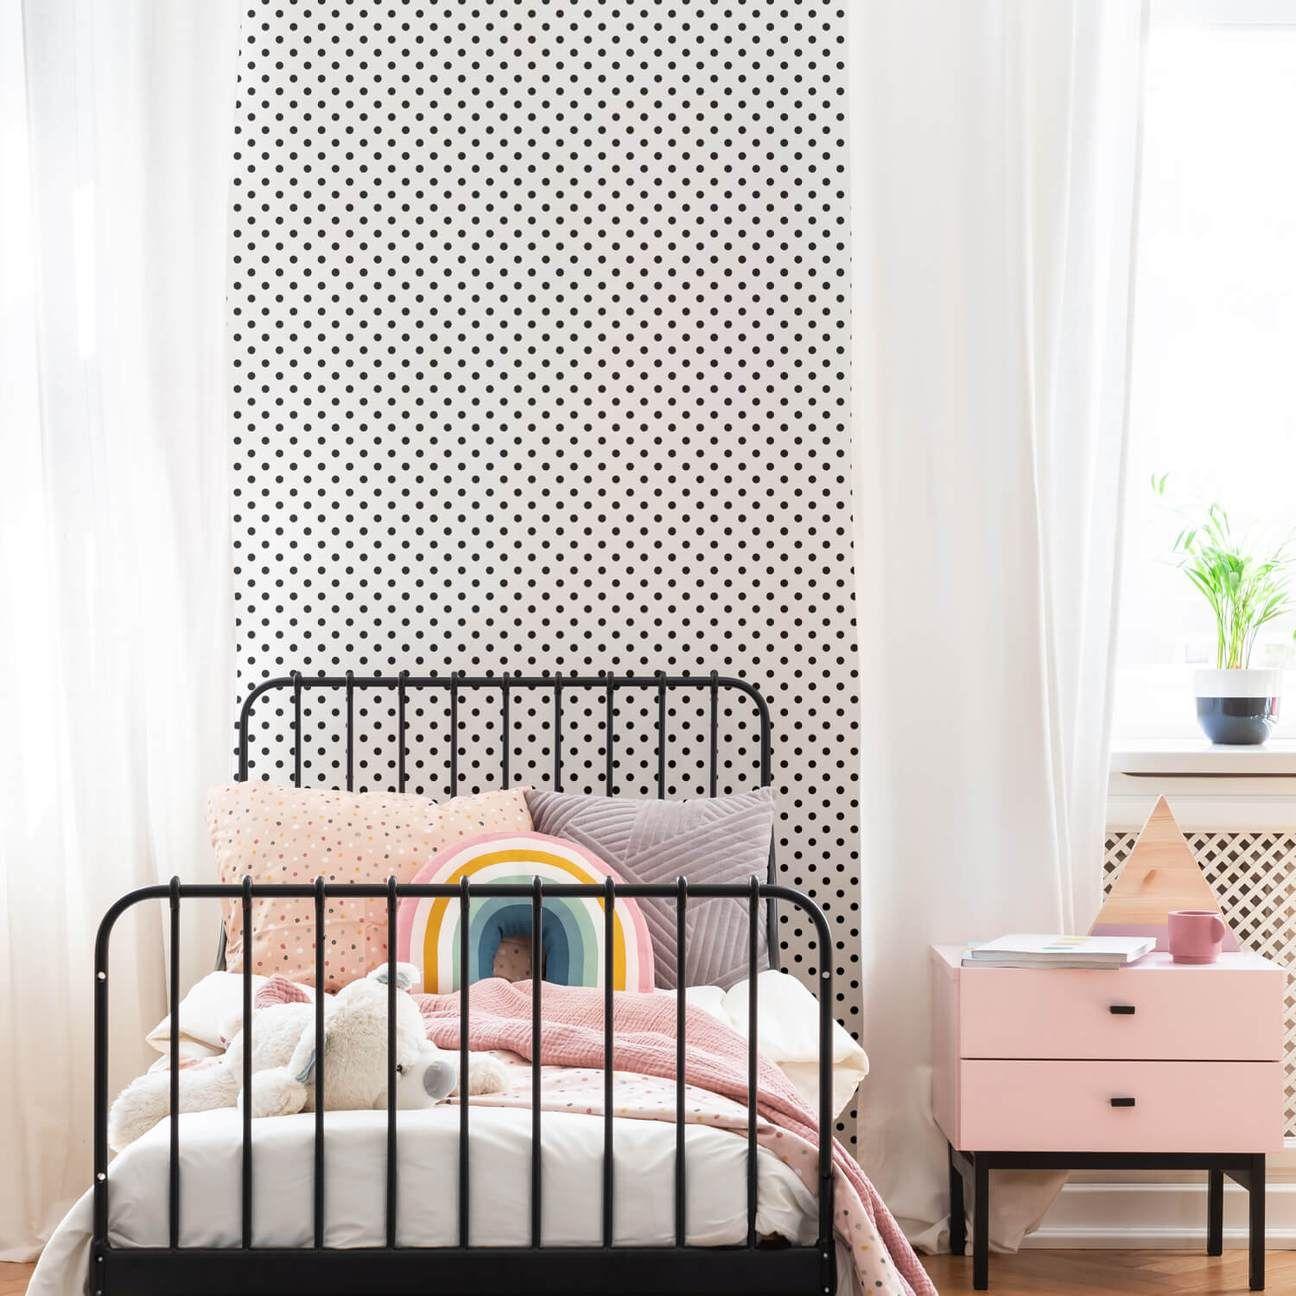 Modern polka dot wallpaper for kids rooms in 2020 Polka